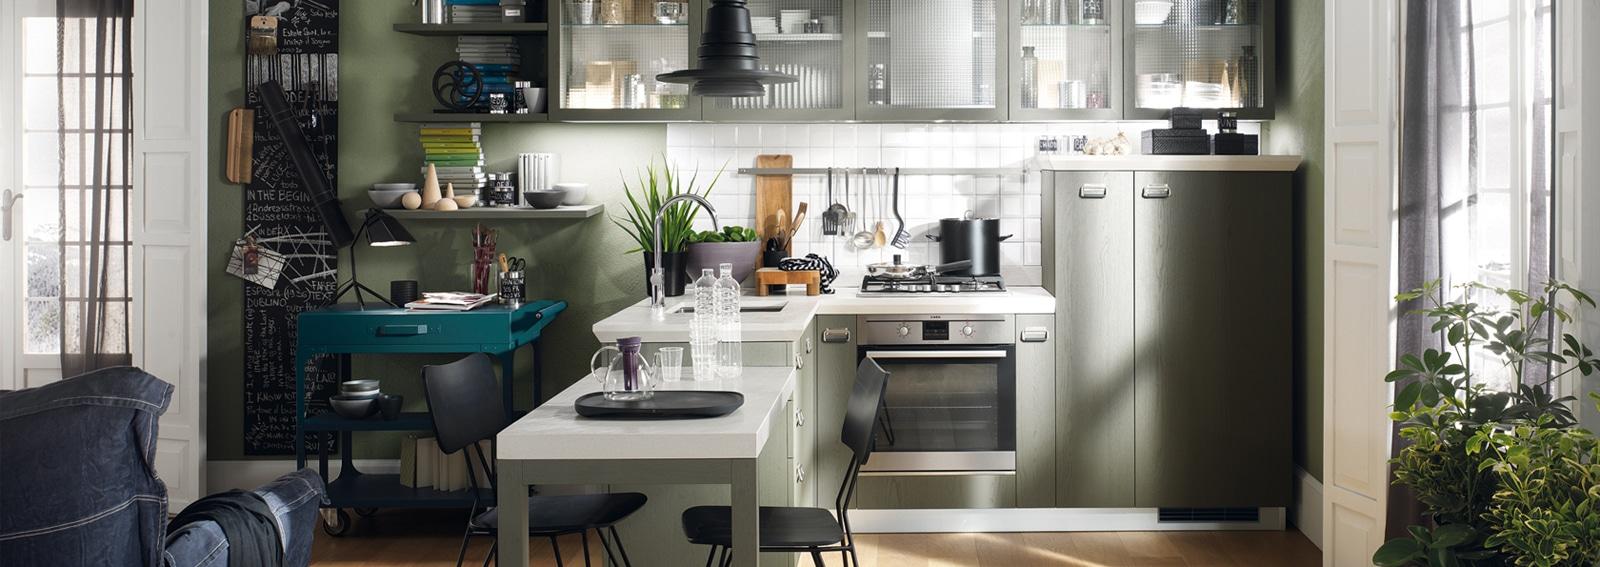 cover-cucina-bella-low-cost-desktop